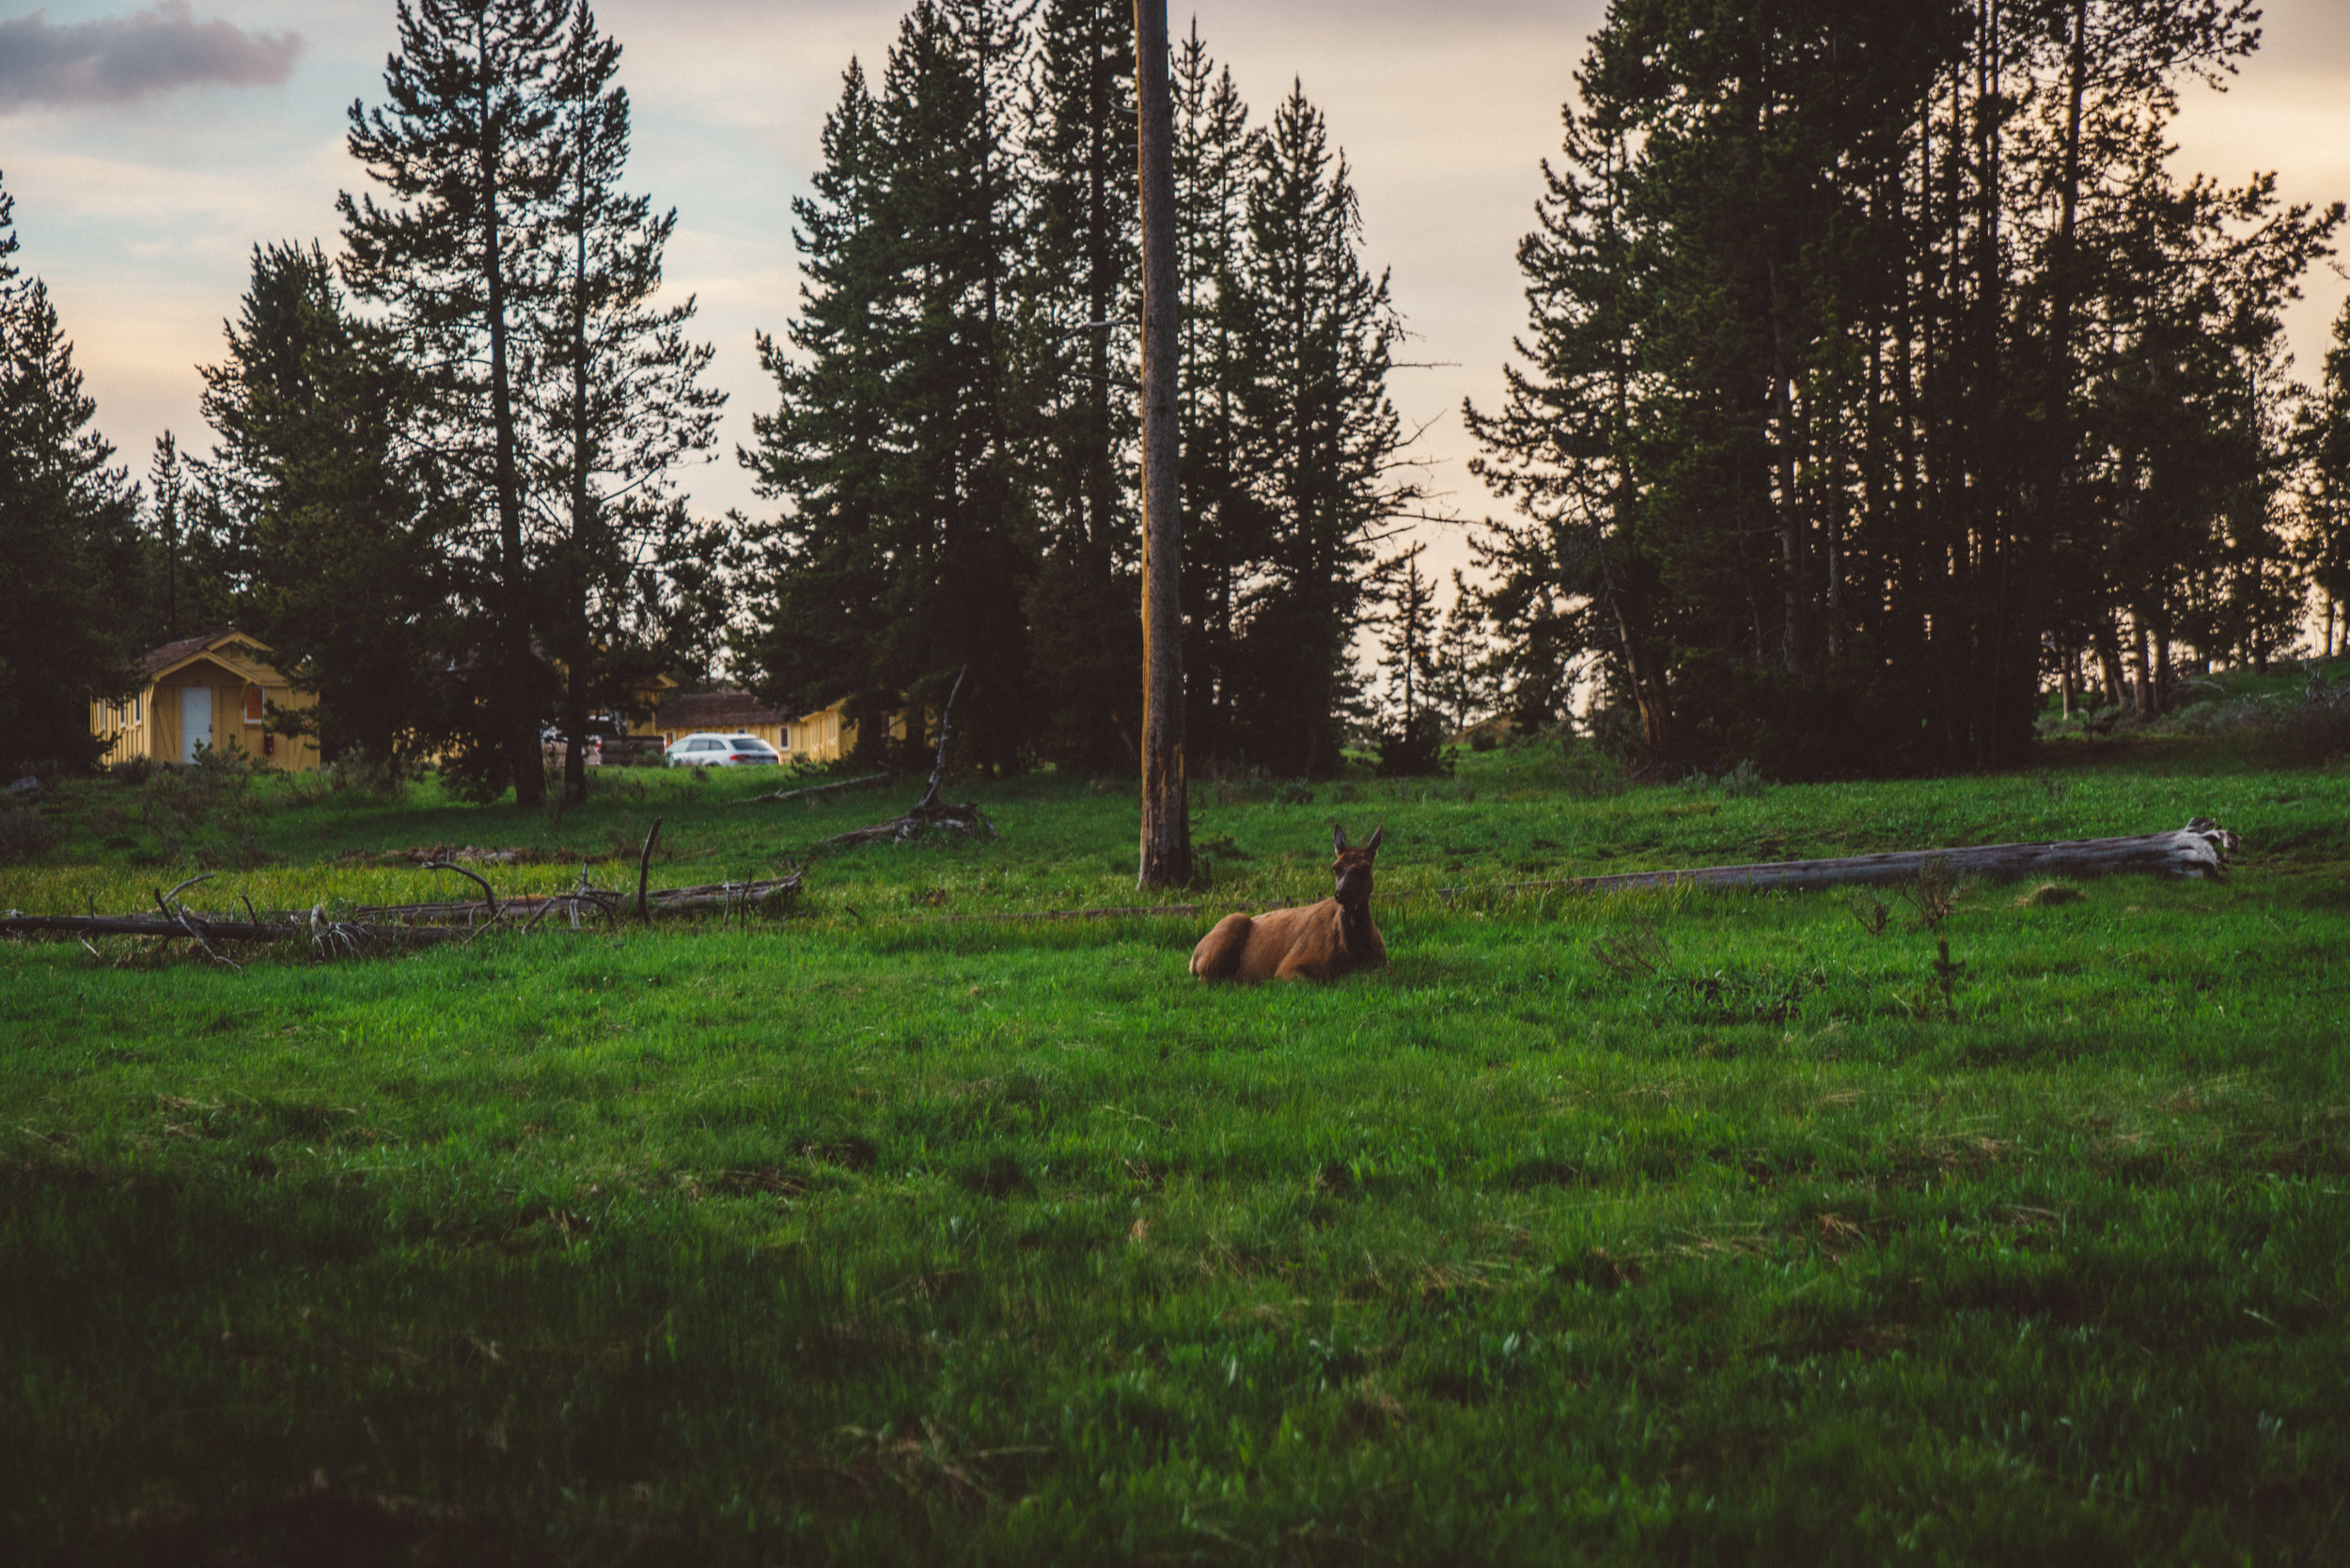 Elk chilling in the village.